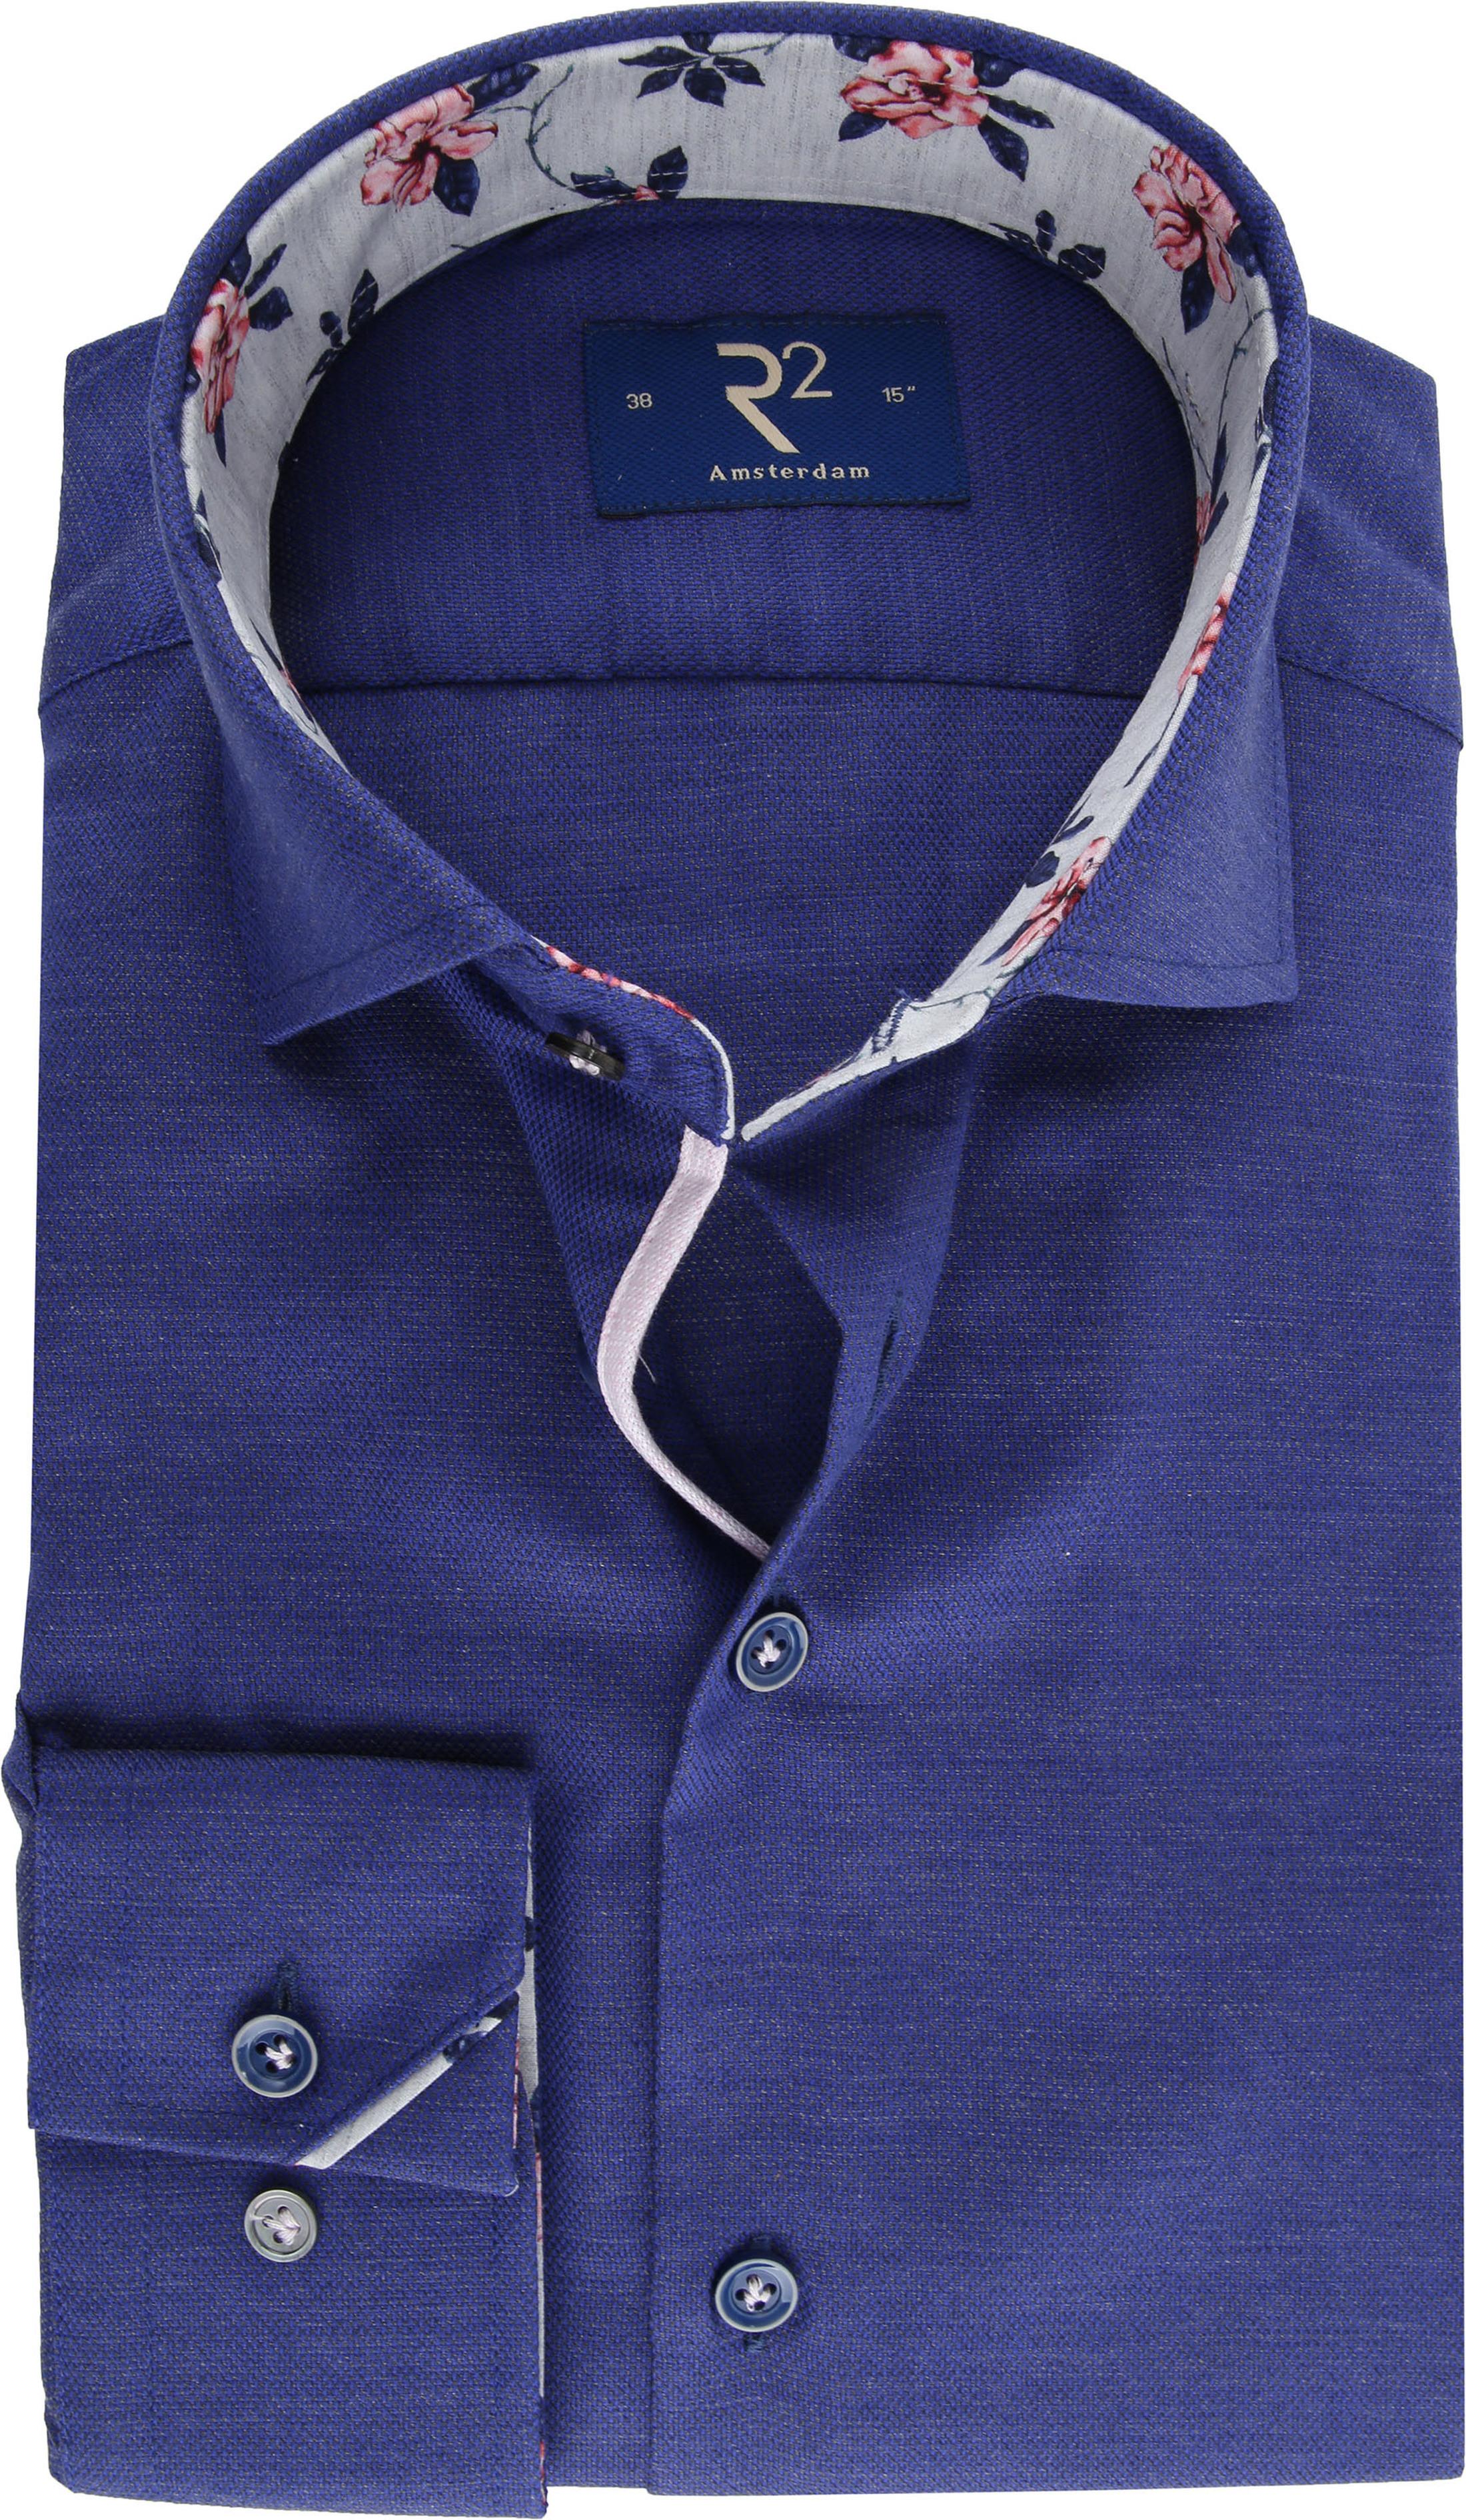 R2 Overhemd Uni Blauw foto 0